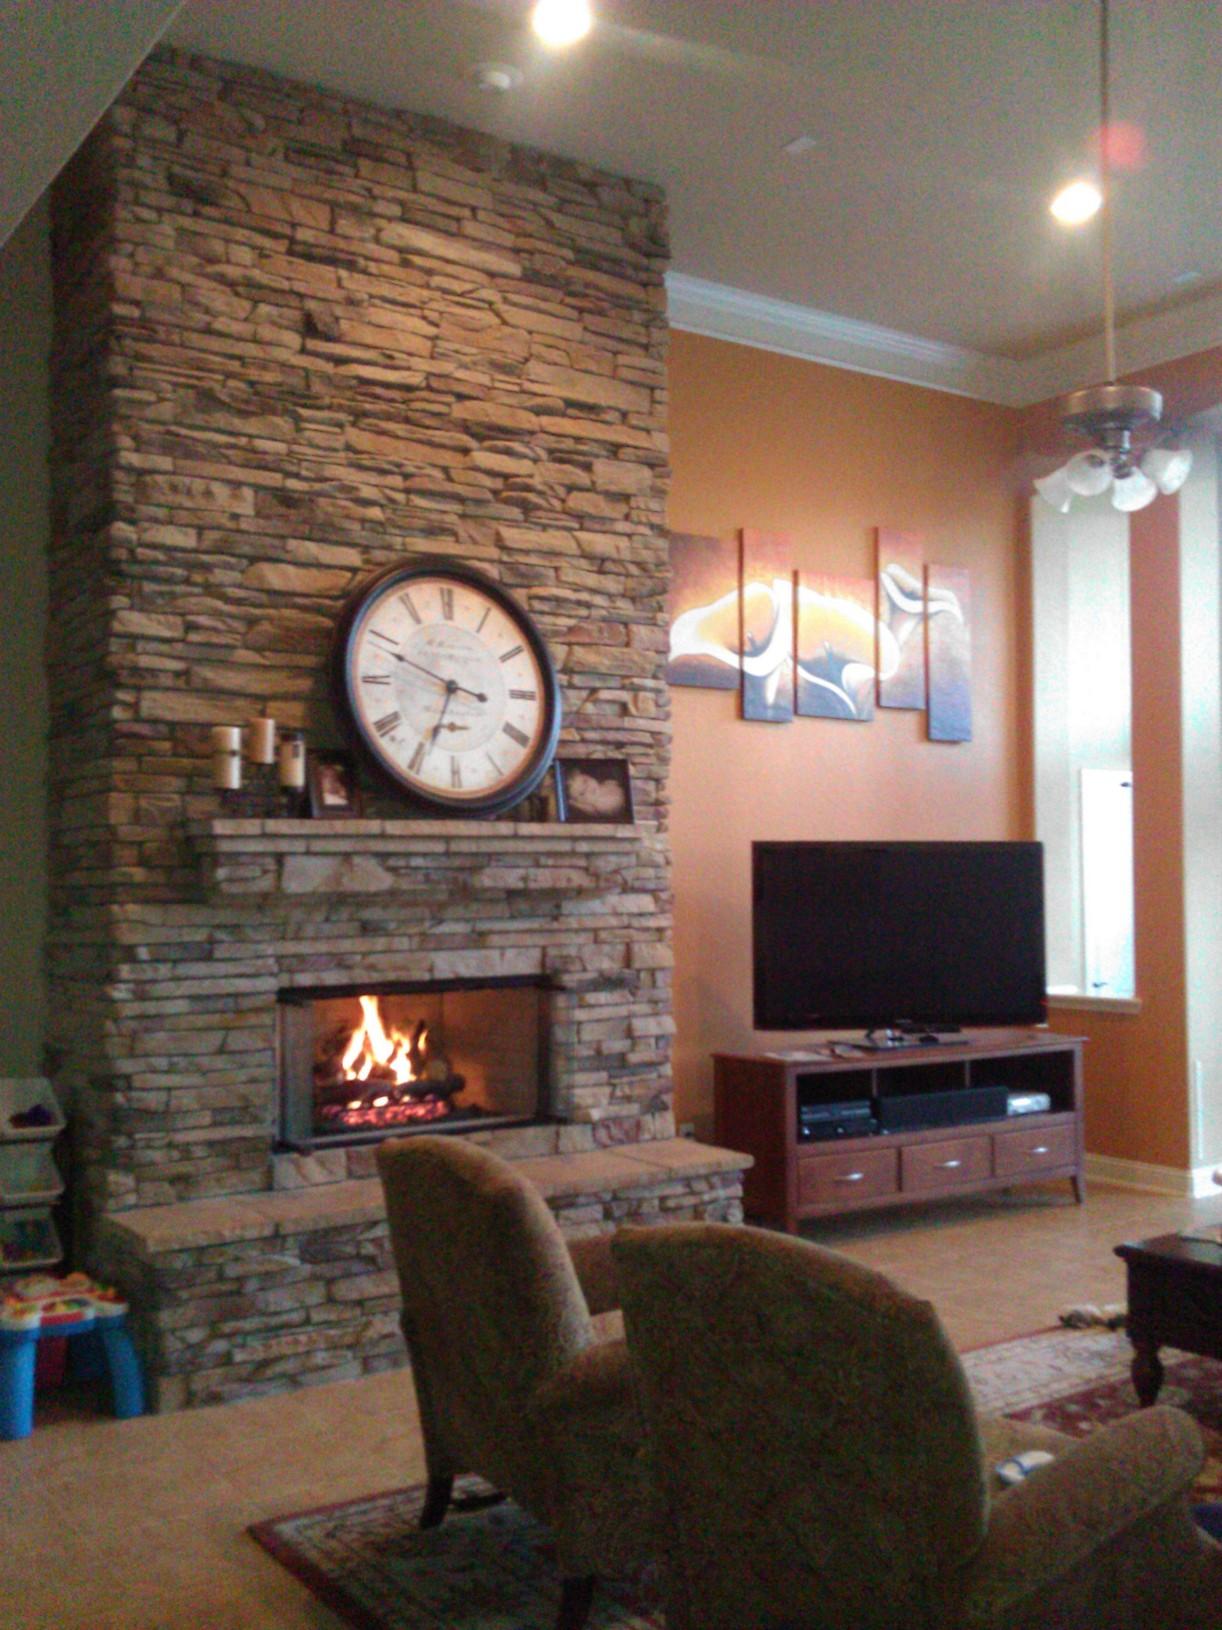 Beautiful True Homes Design Center Images Amazing House